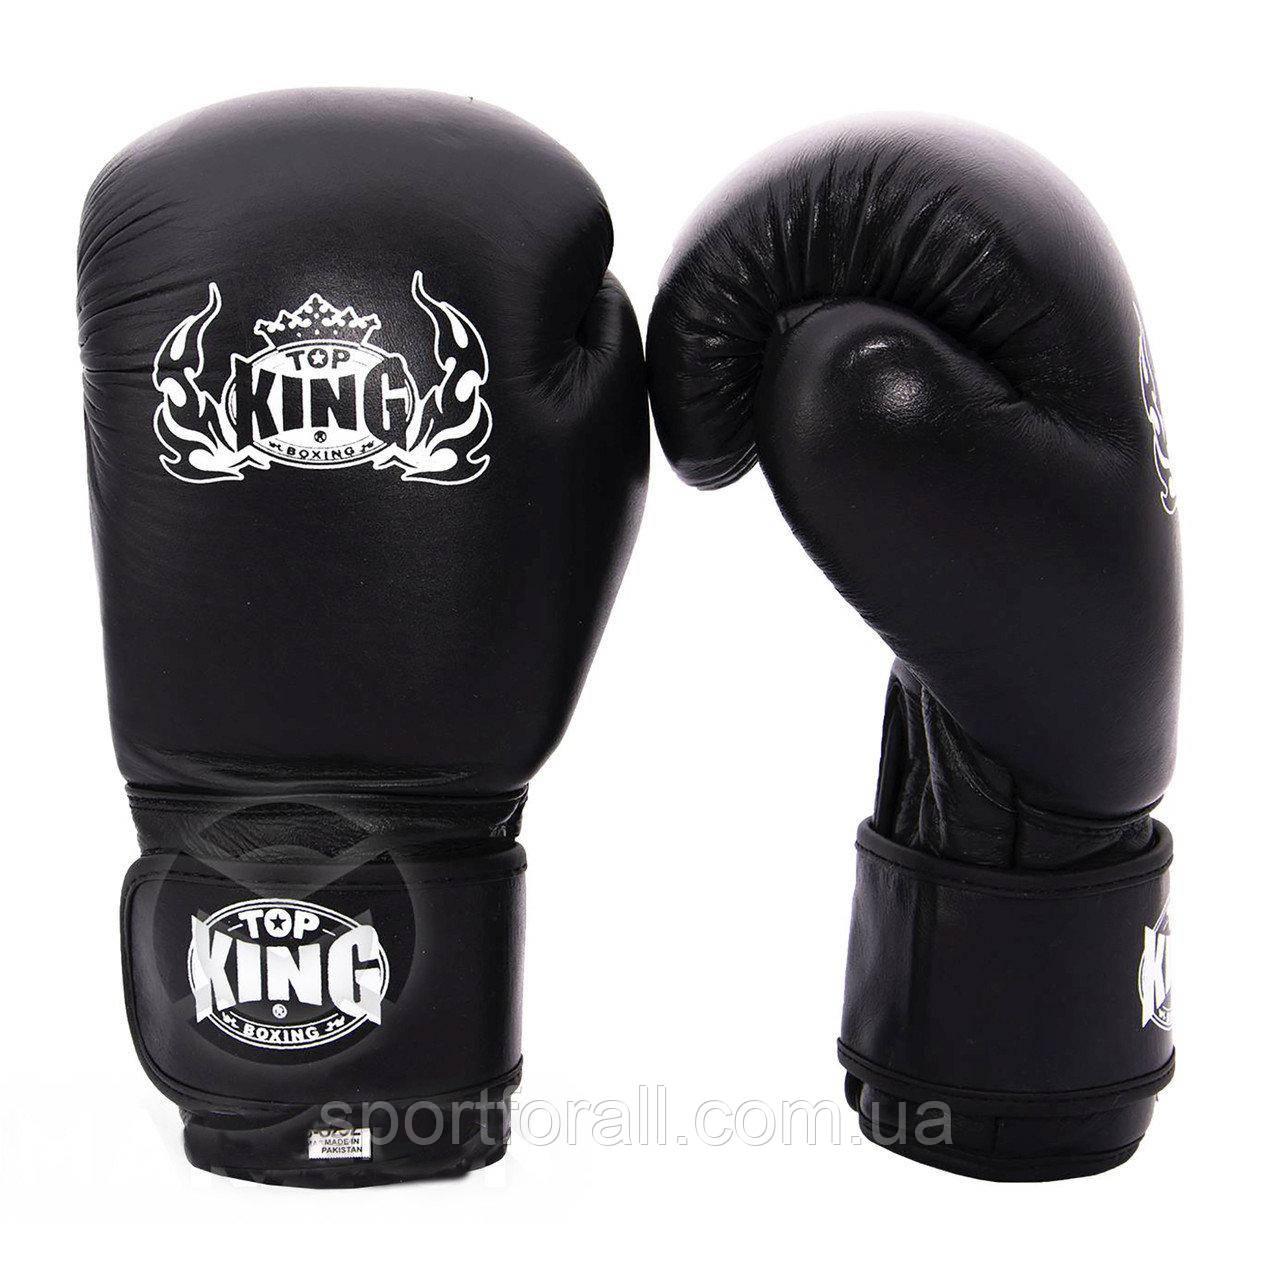 Перчатки для бокса кожанные Top King 8oz(REPLIKA)